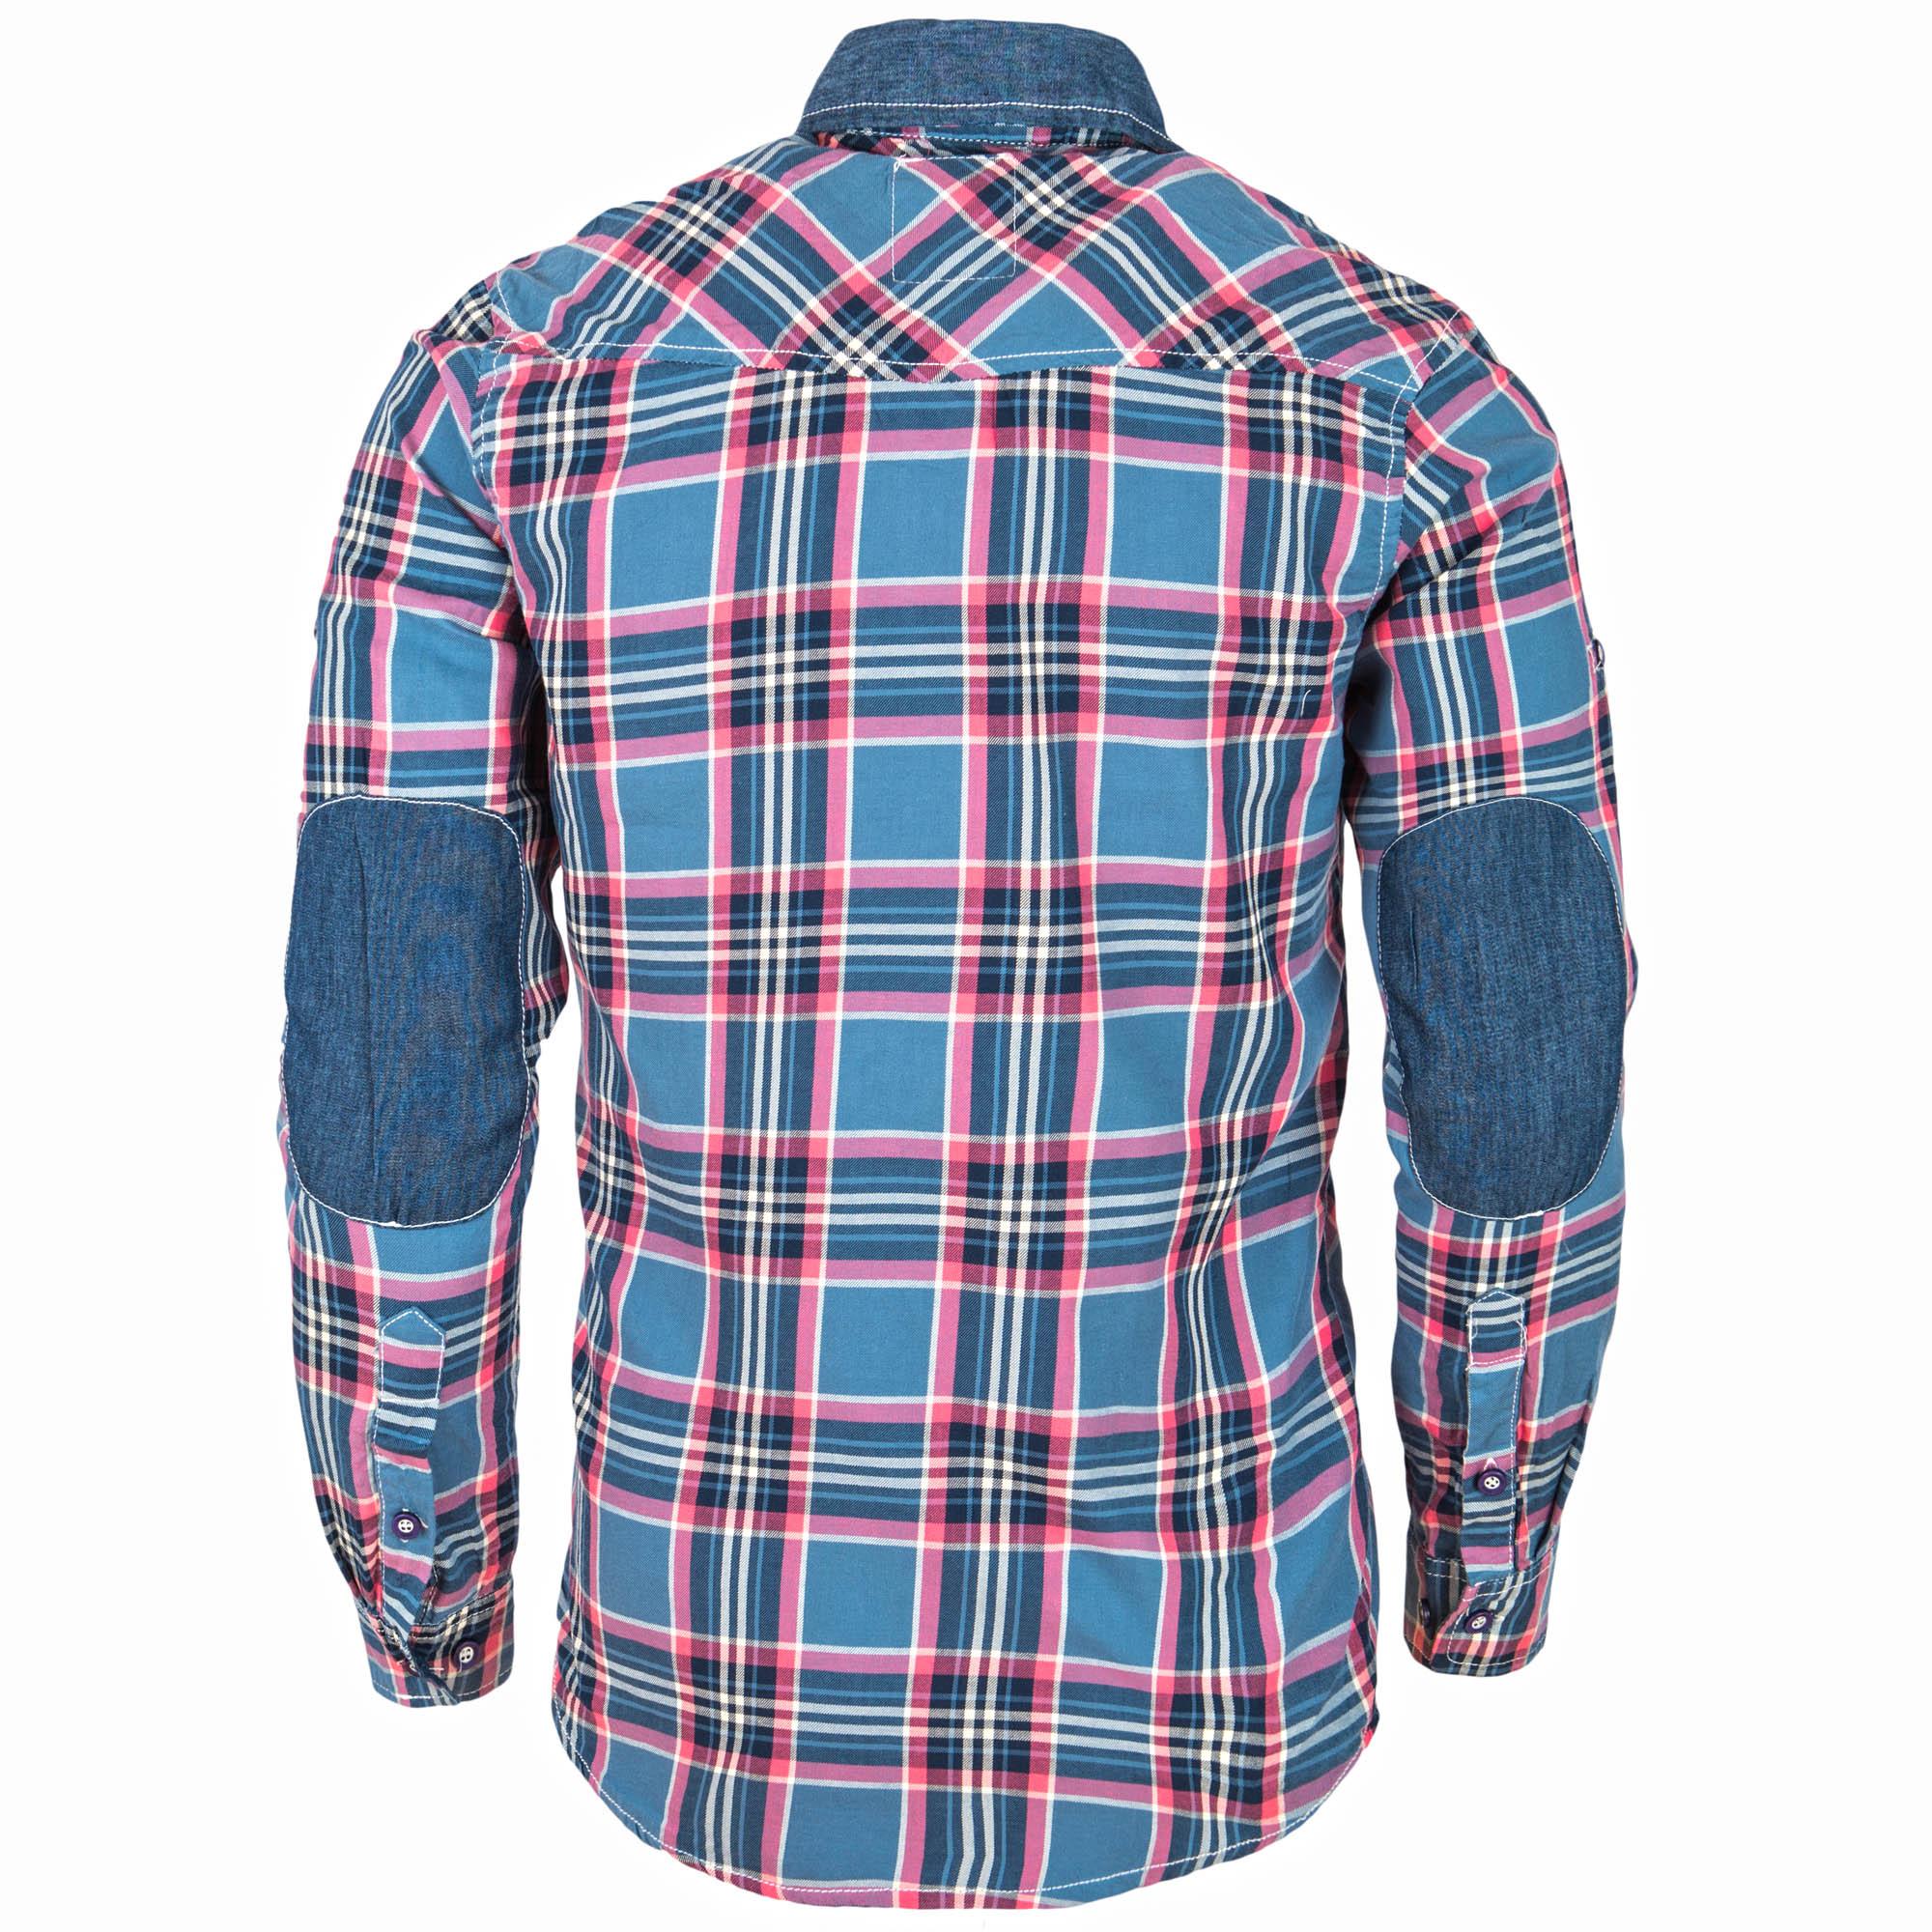 ba1a851949208 Koszule i marynarki - Koszula męska w kratę granatowa Recea - Recea ...